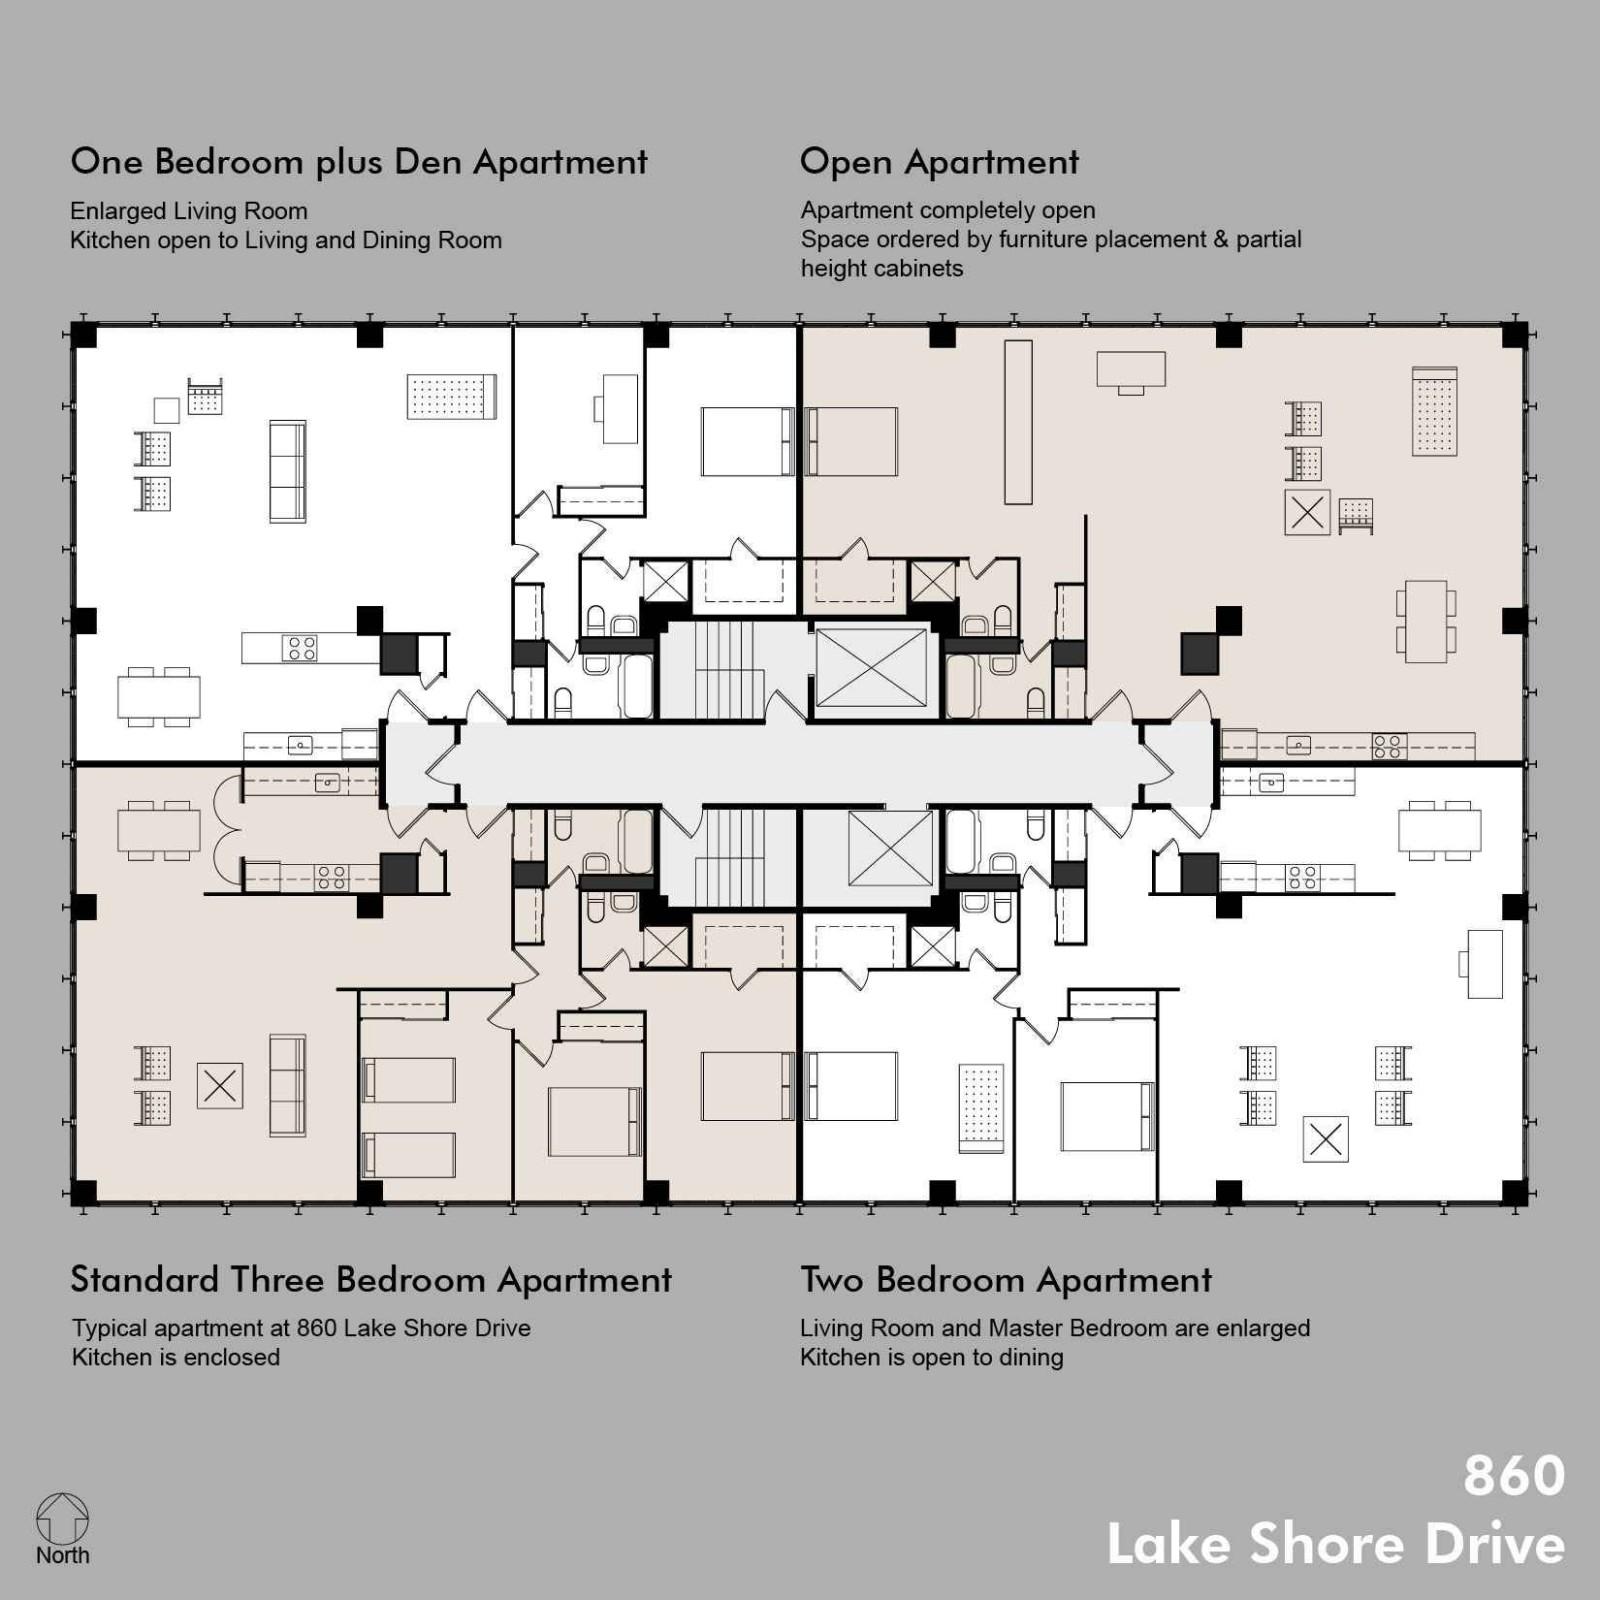 12 Unit Apartment Building Plans and Modern Apartment Design Plans  - Apartment Unit Design